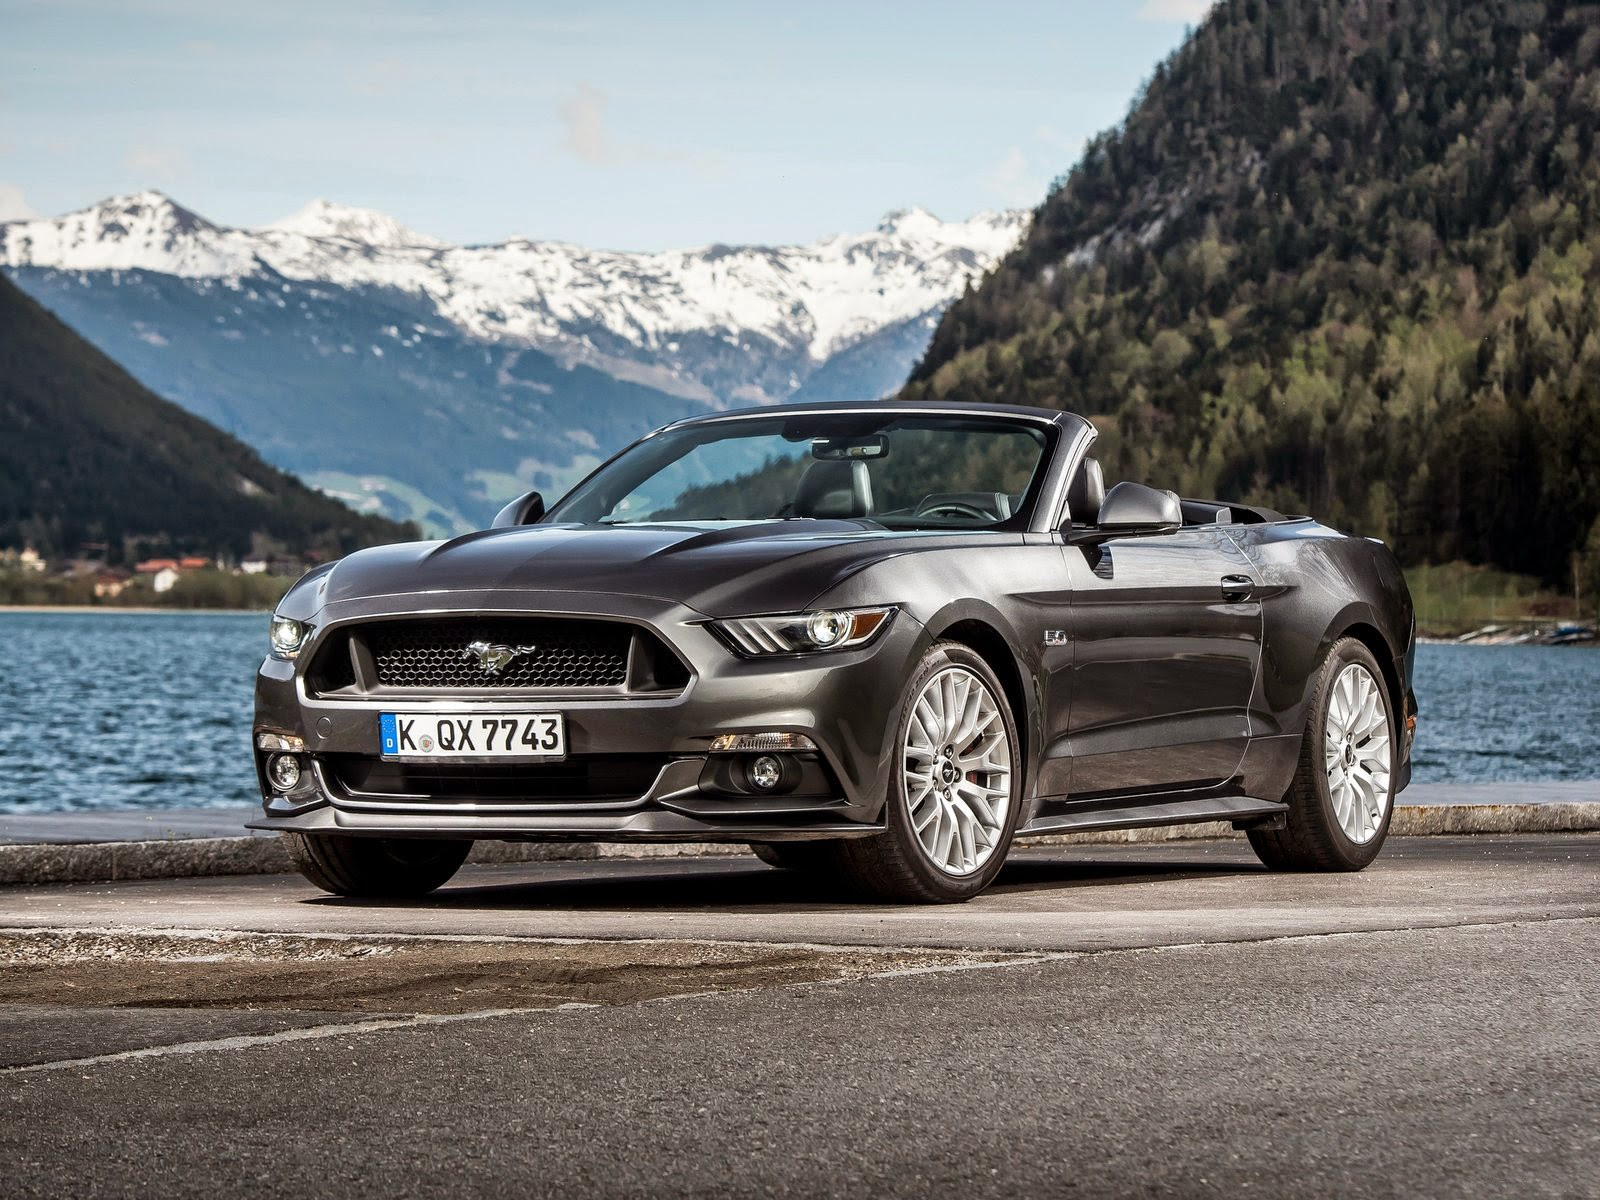 Ford-Mustang Convertible EU-Version wallpapers 野馬跑車桌布 | Free HD Wallpapers